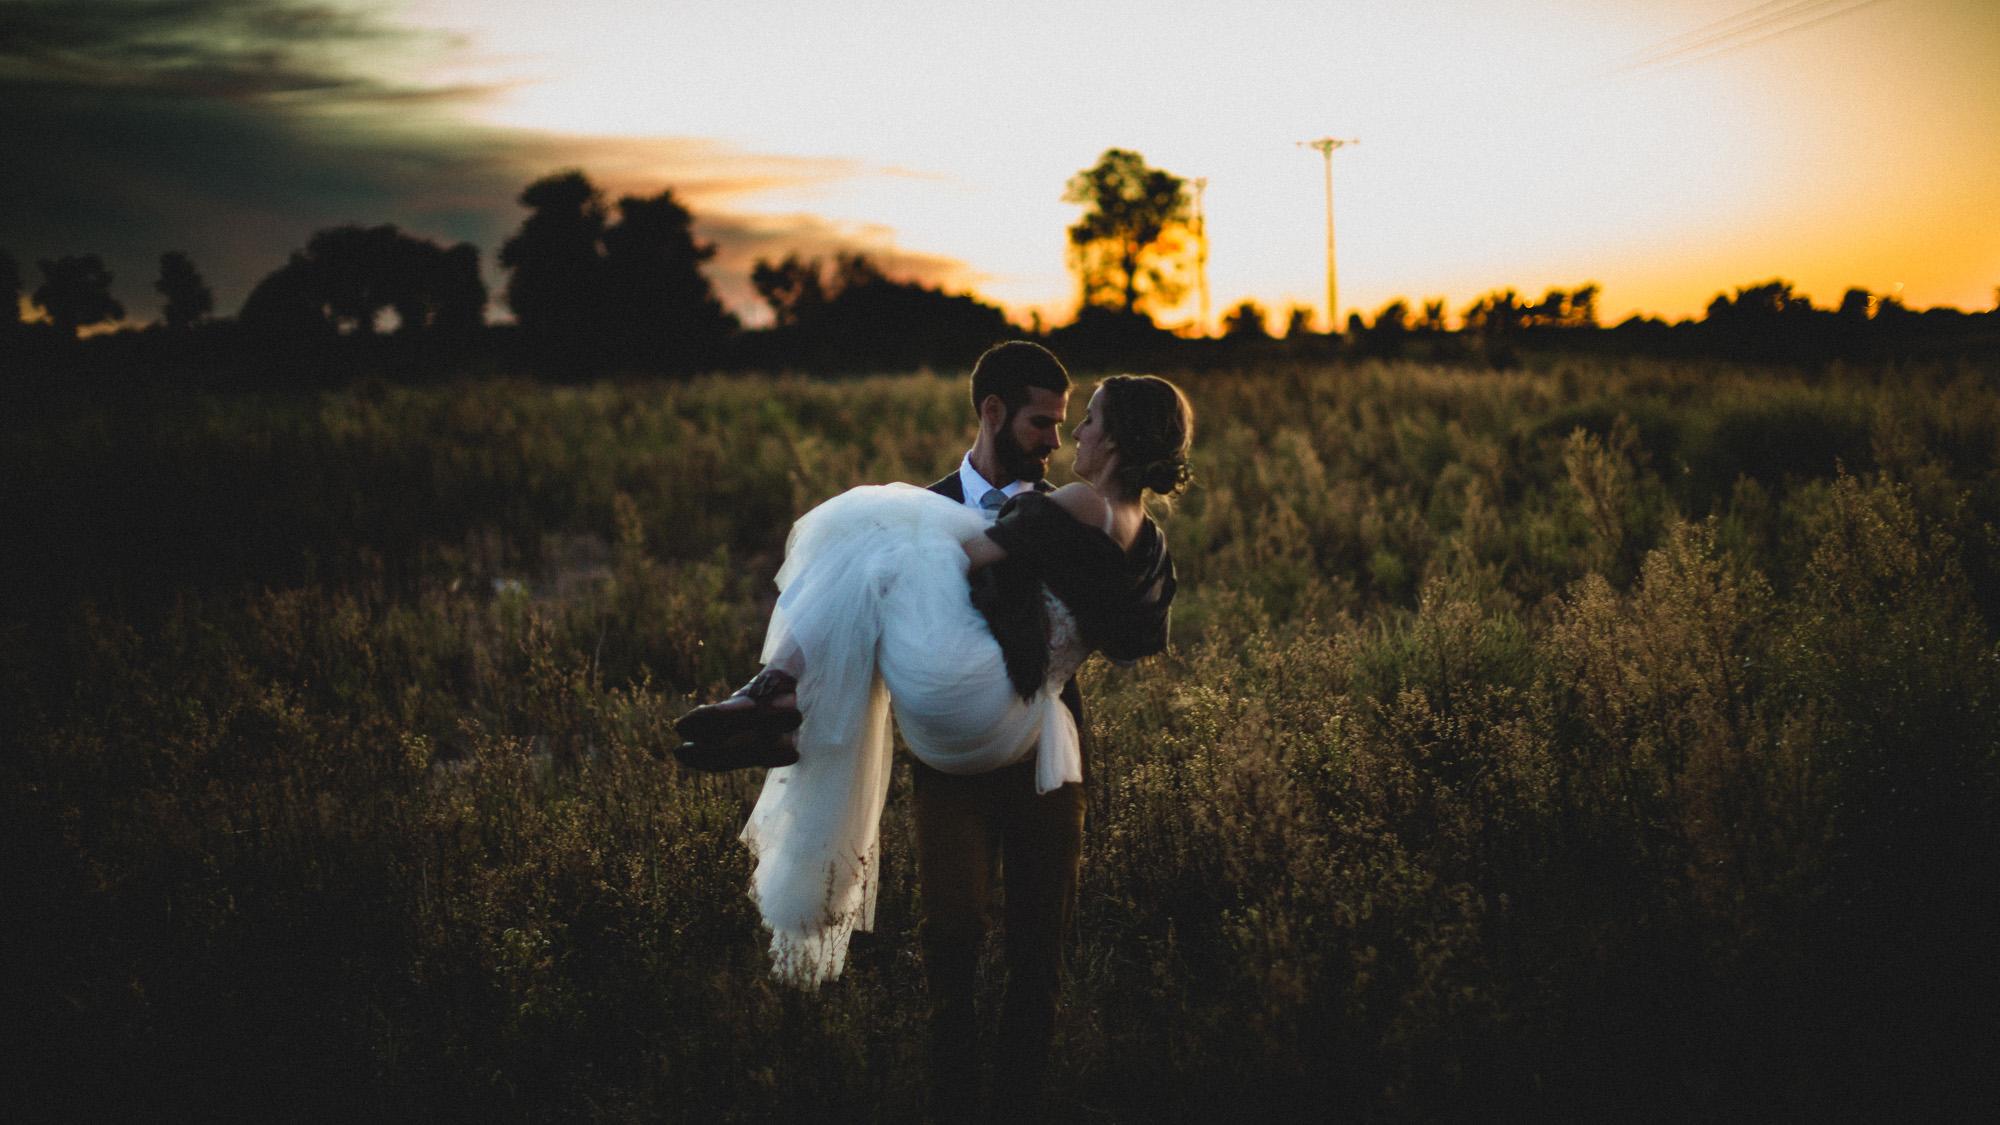 alec_vanderboom_springfield_missouri_wedding-0079.jpg